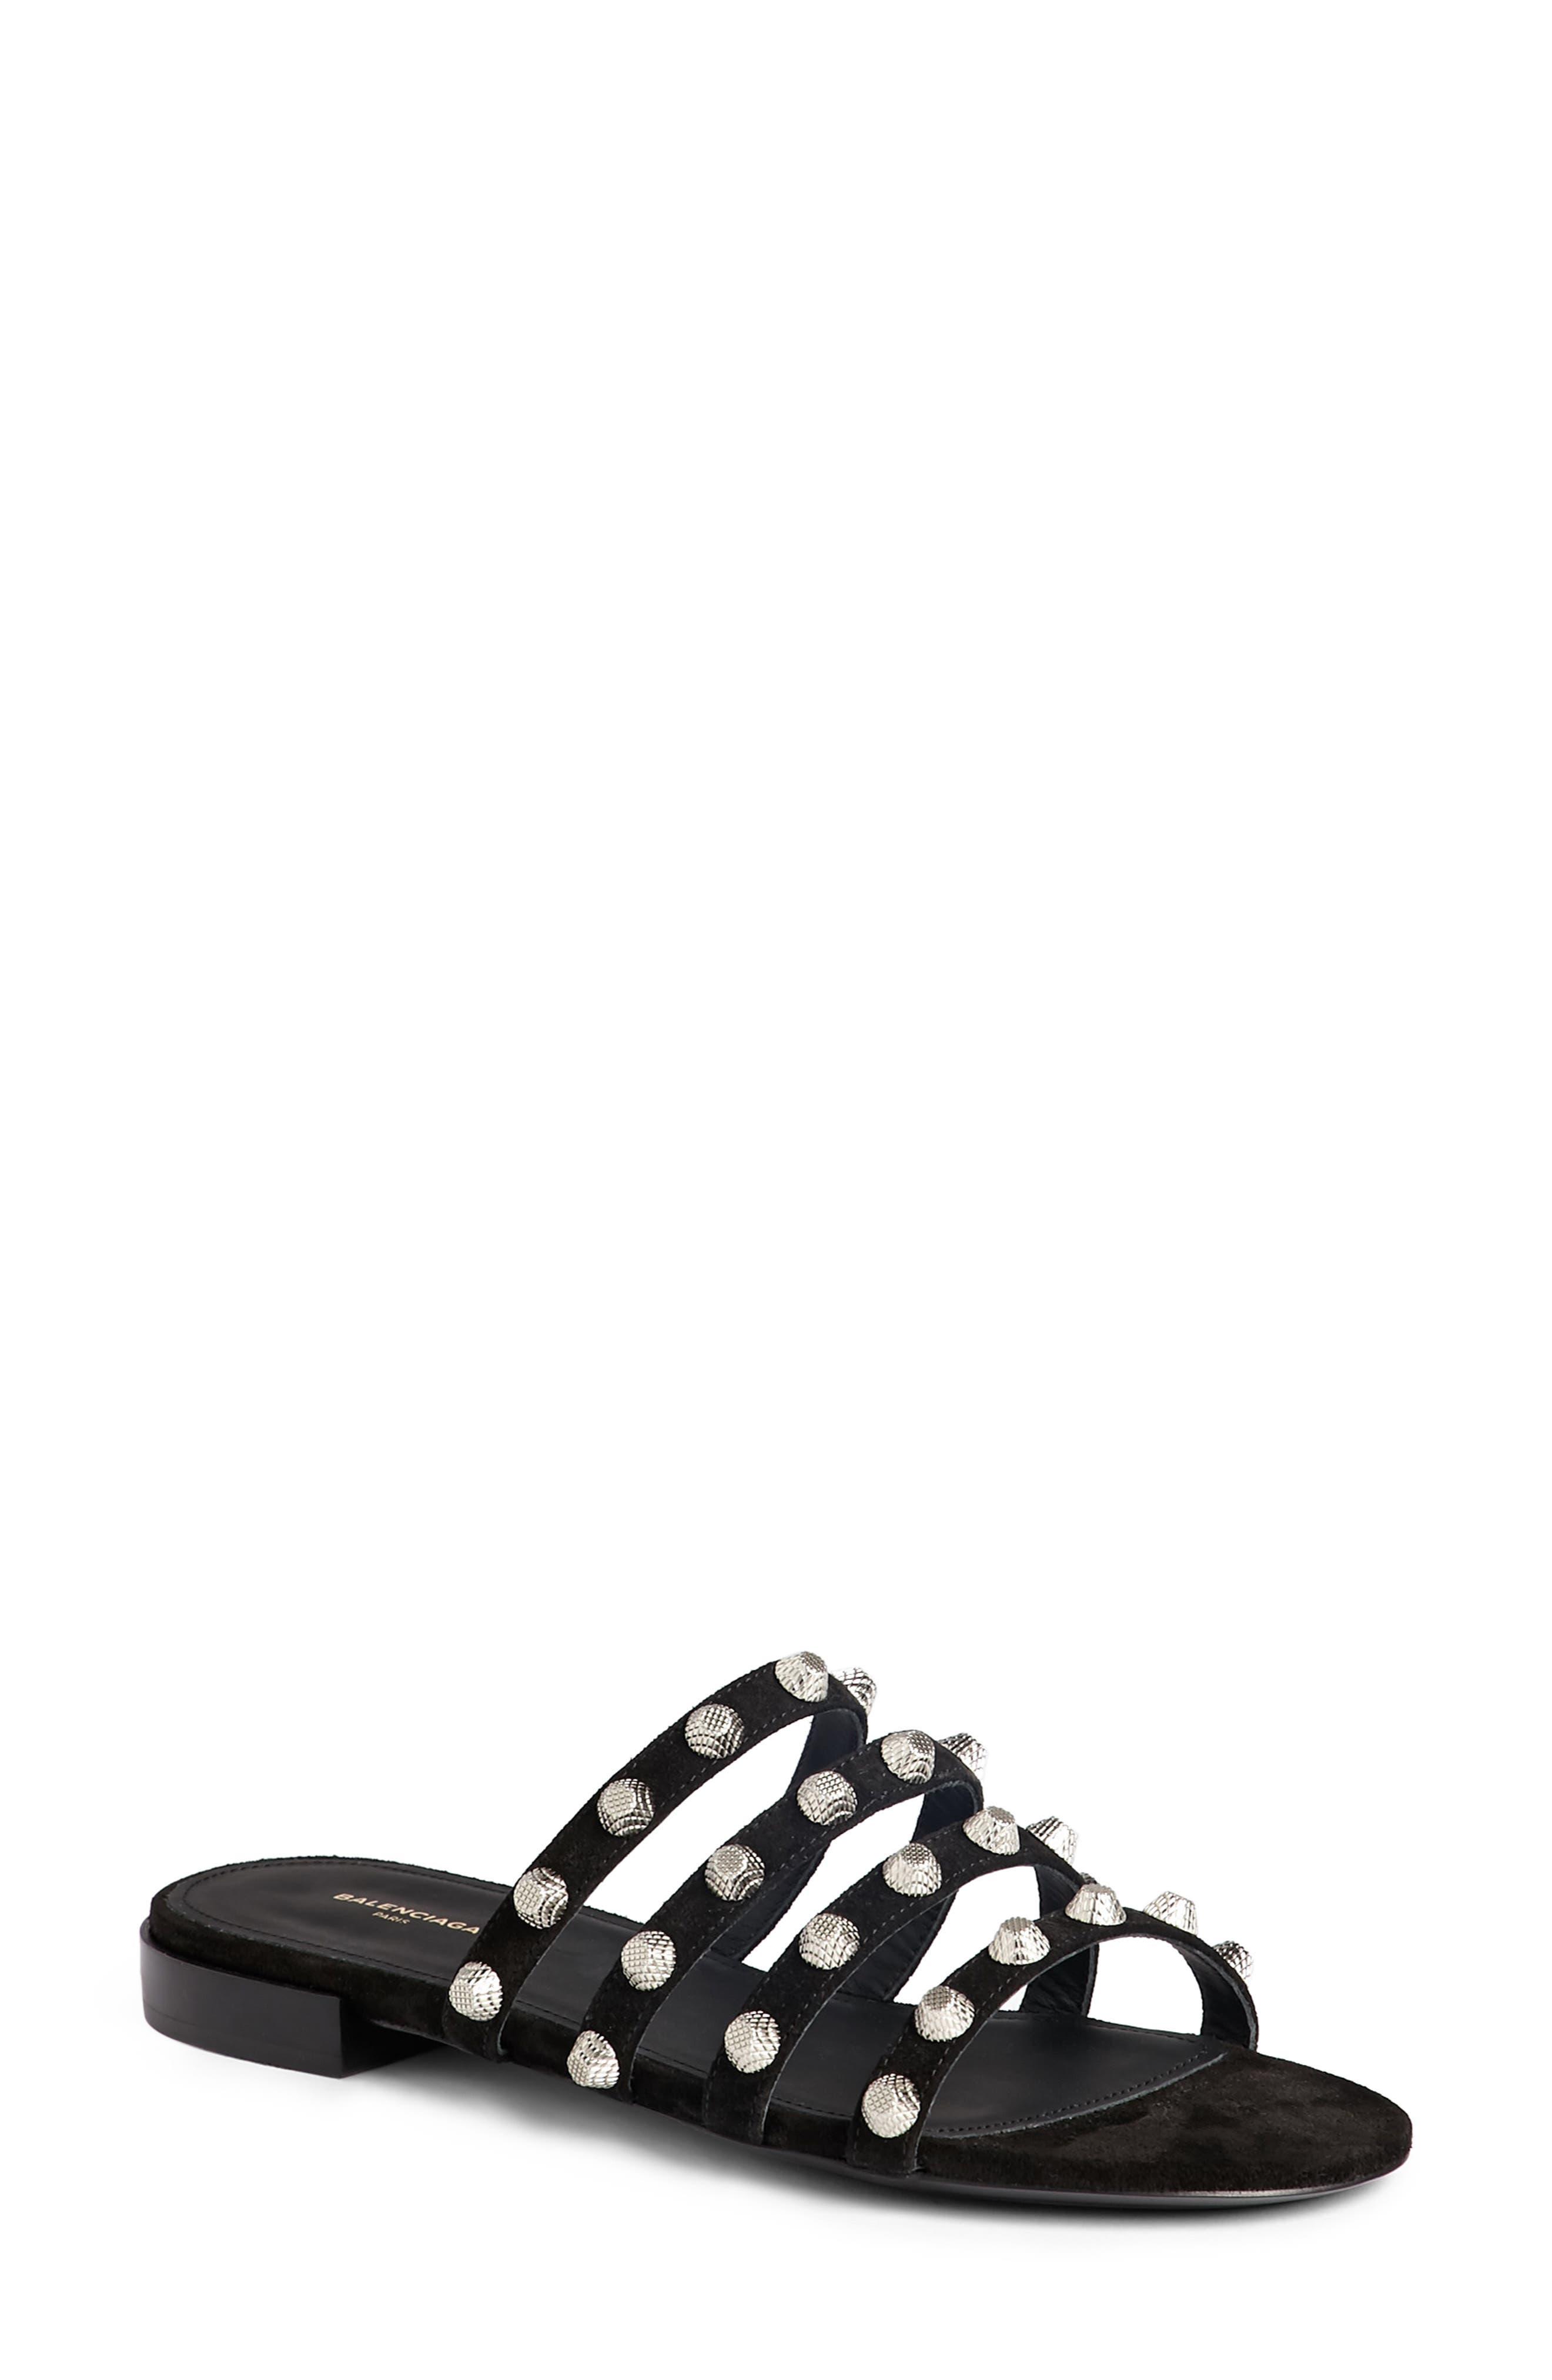 Balenciaga Studded Slide Sandal (Women)